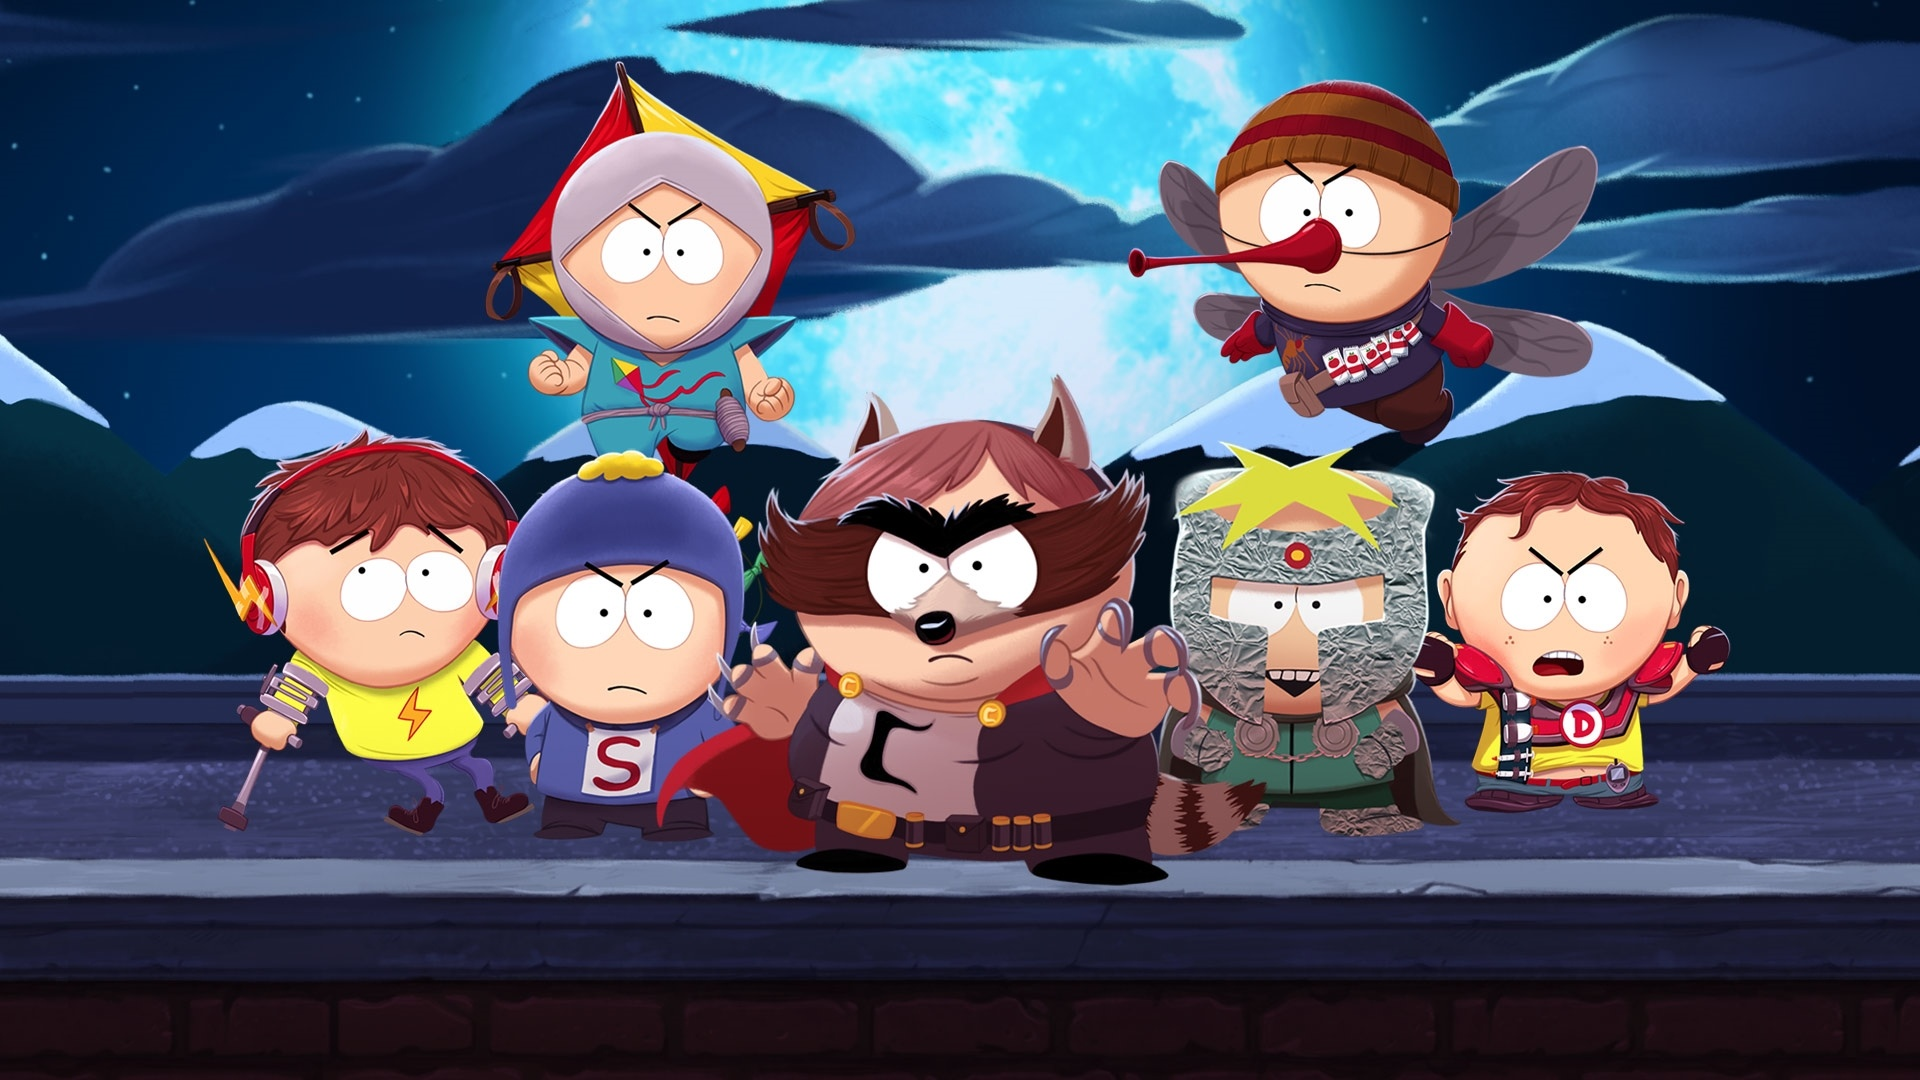 South Park computer wallpaper